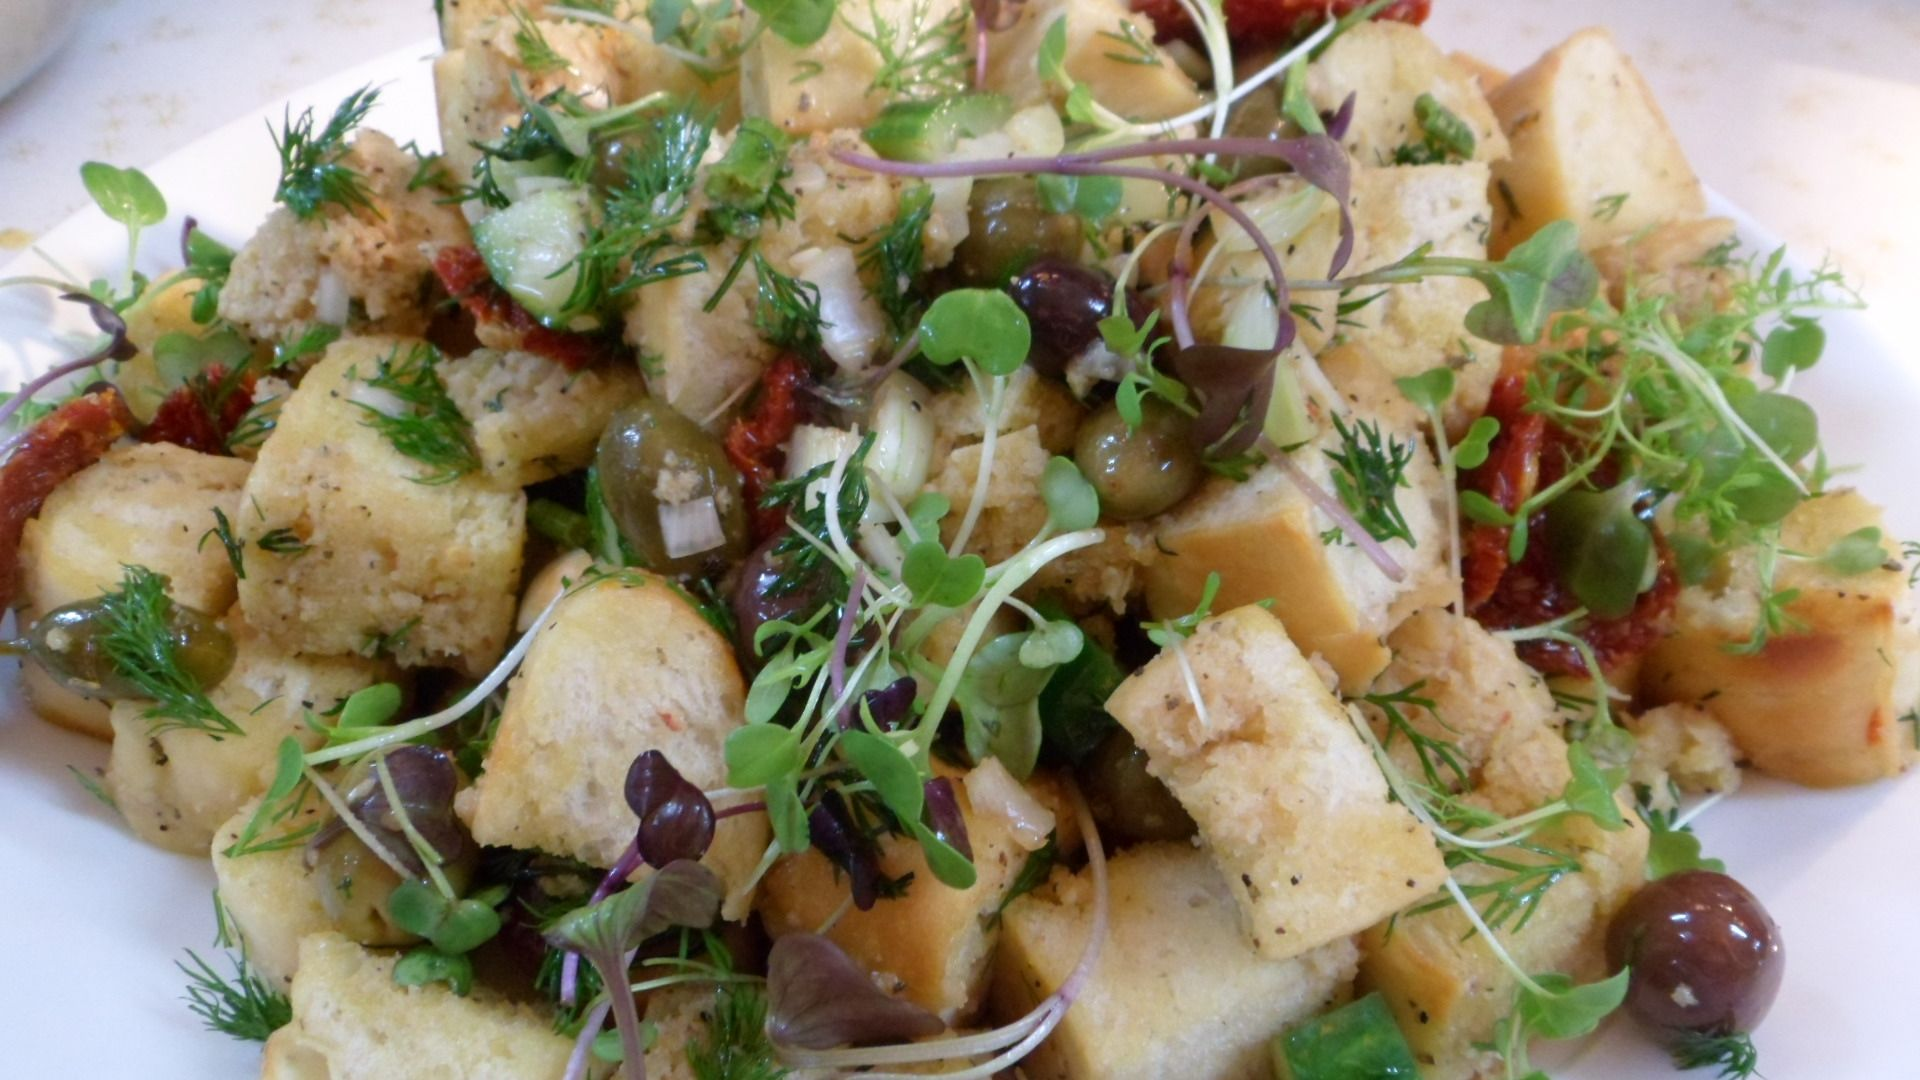 Panzanella bread salad | www.chefkevinblakeman.com | Pinterest